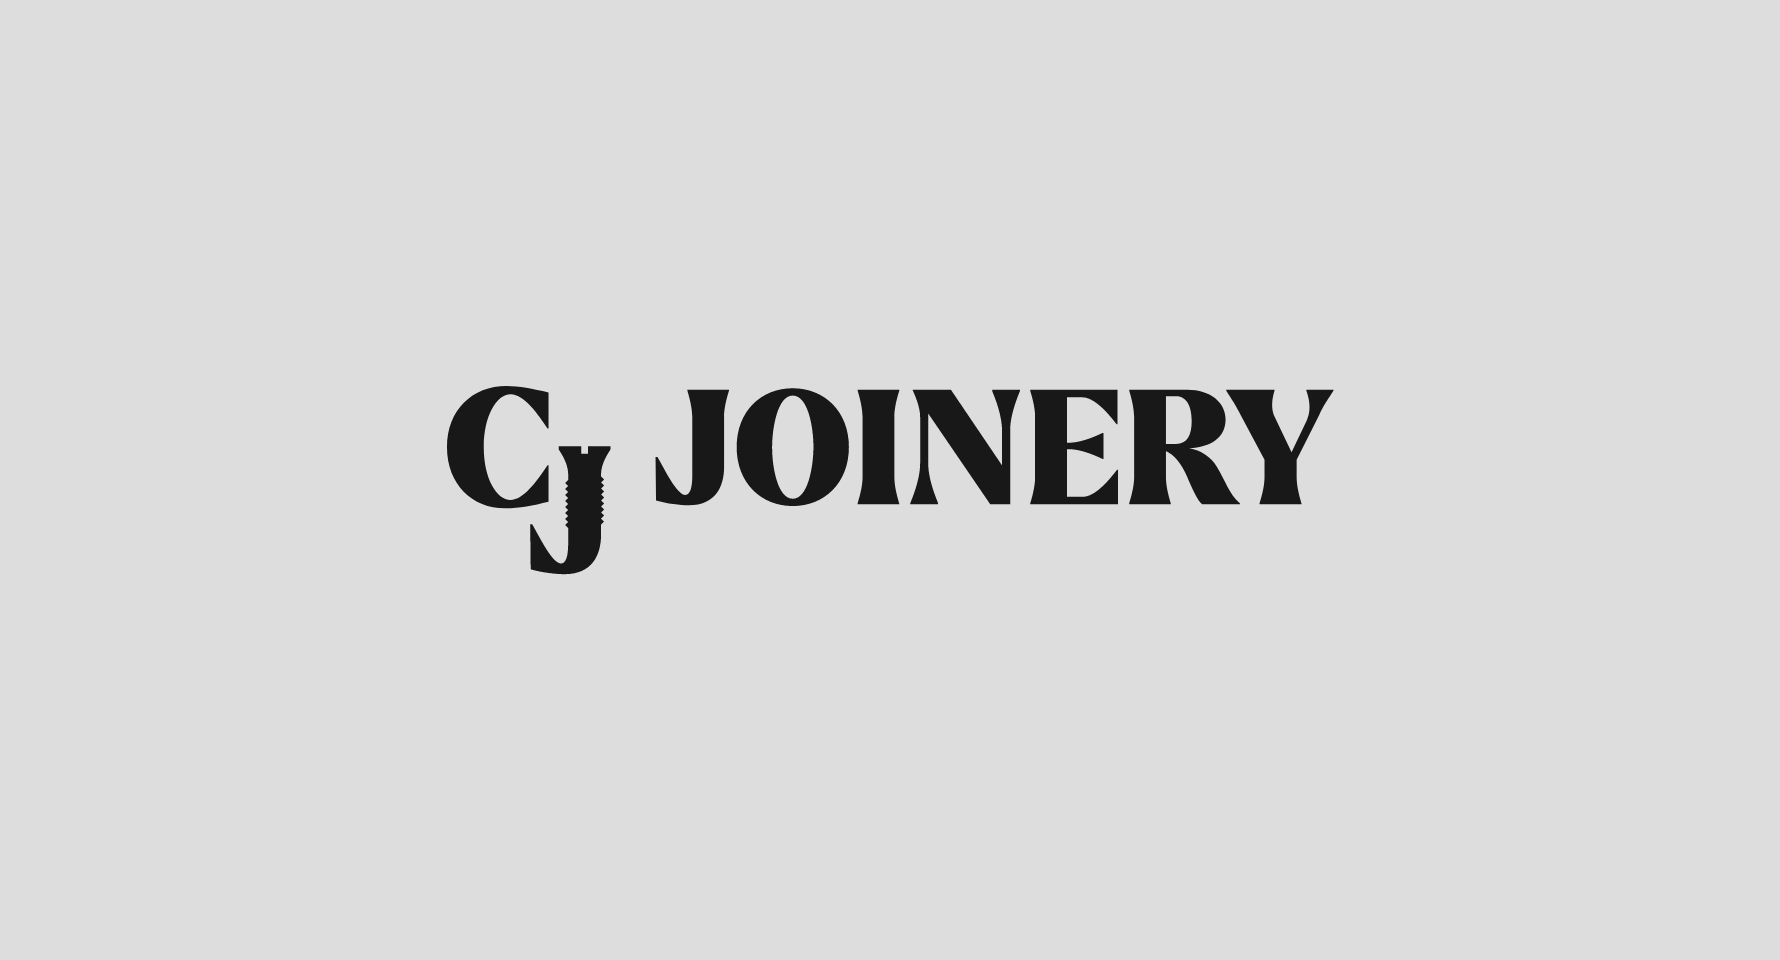 13_CJ Joinery@2x